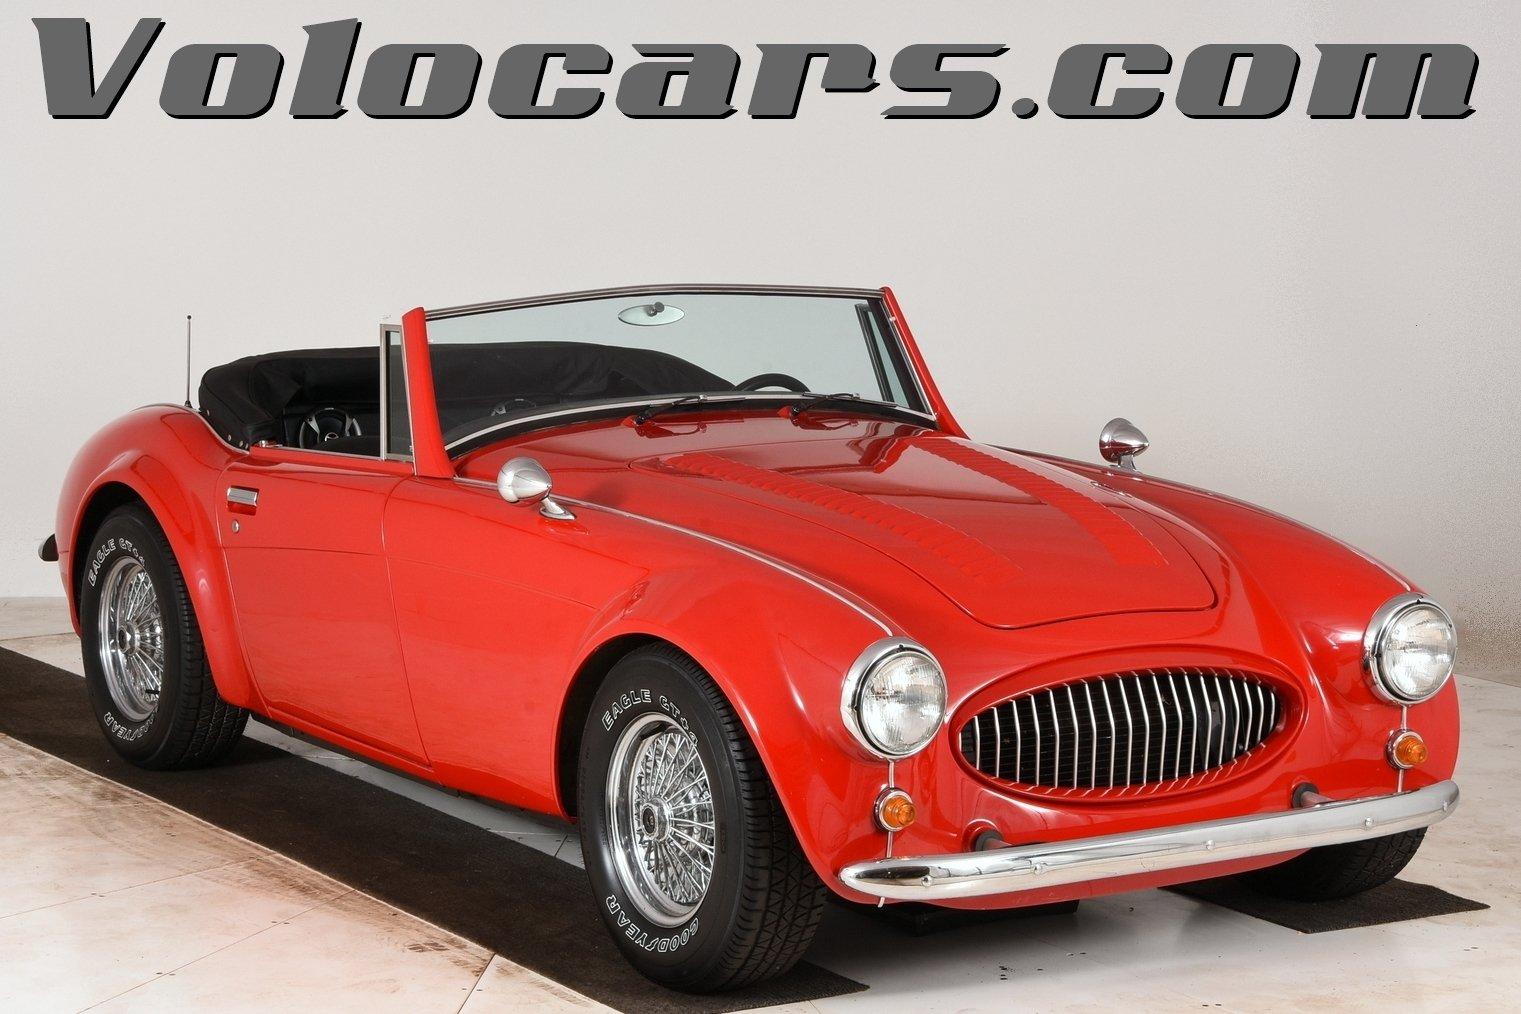 1964 austin healey 3000 replica